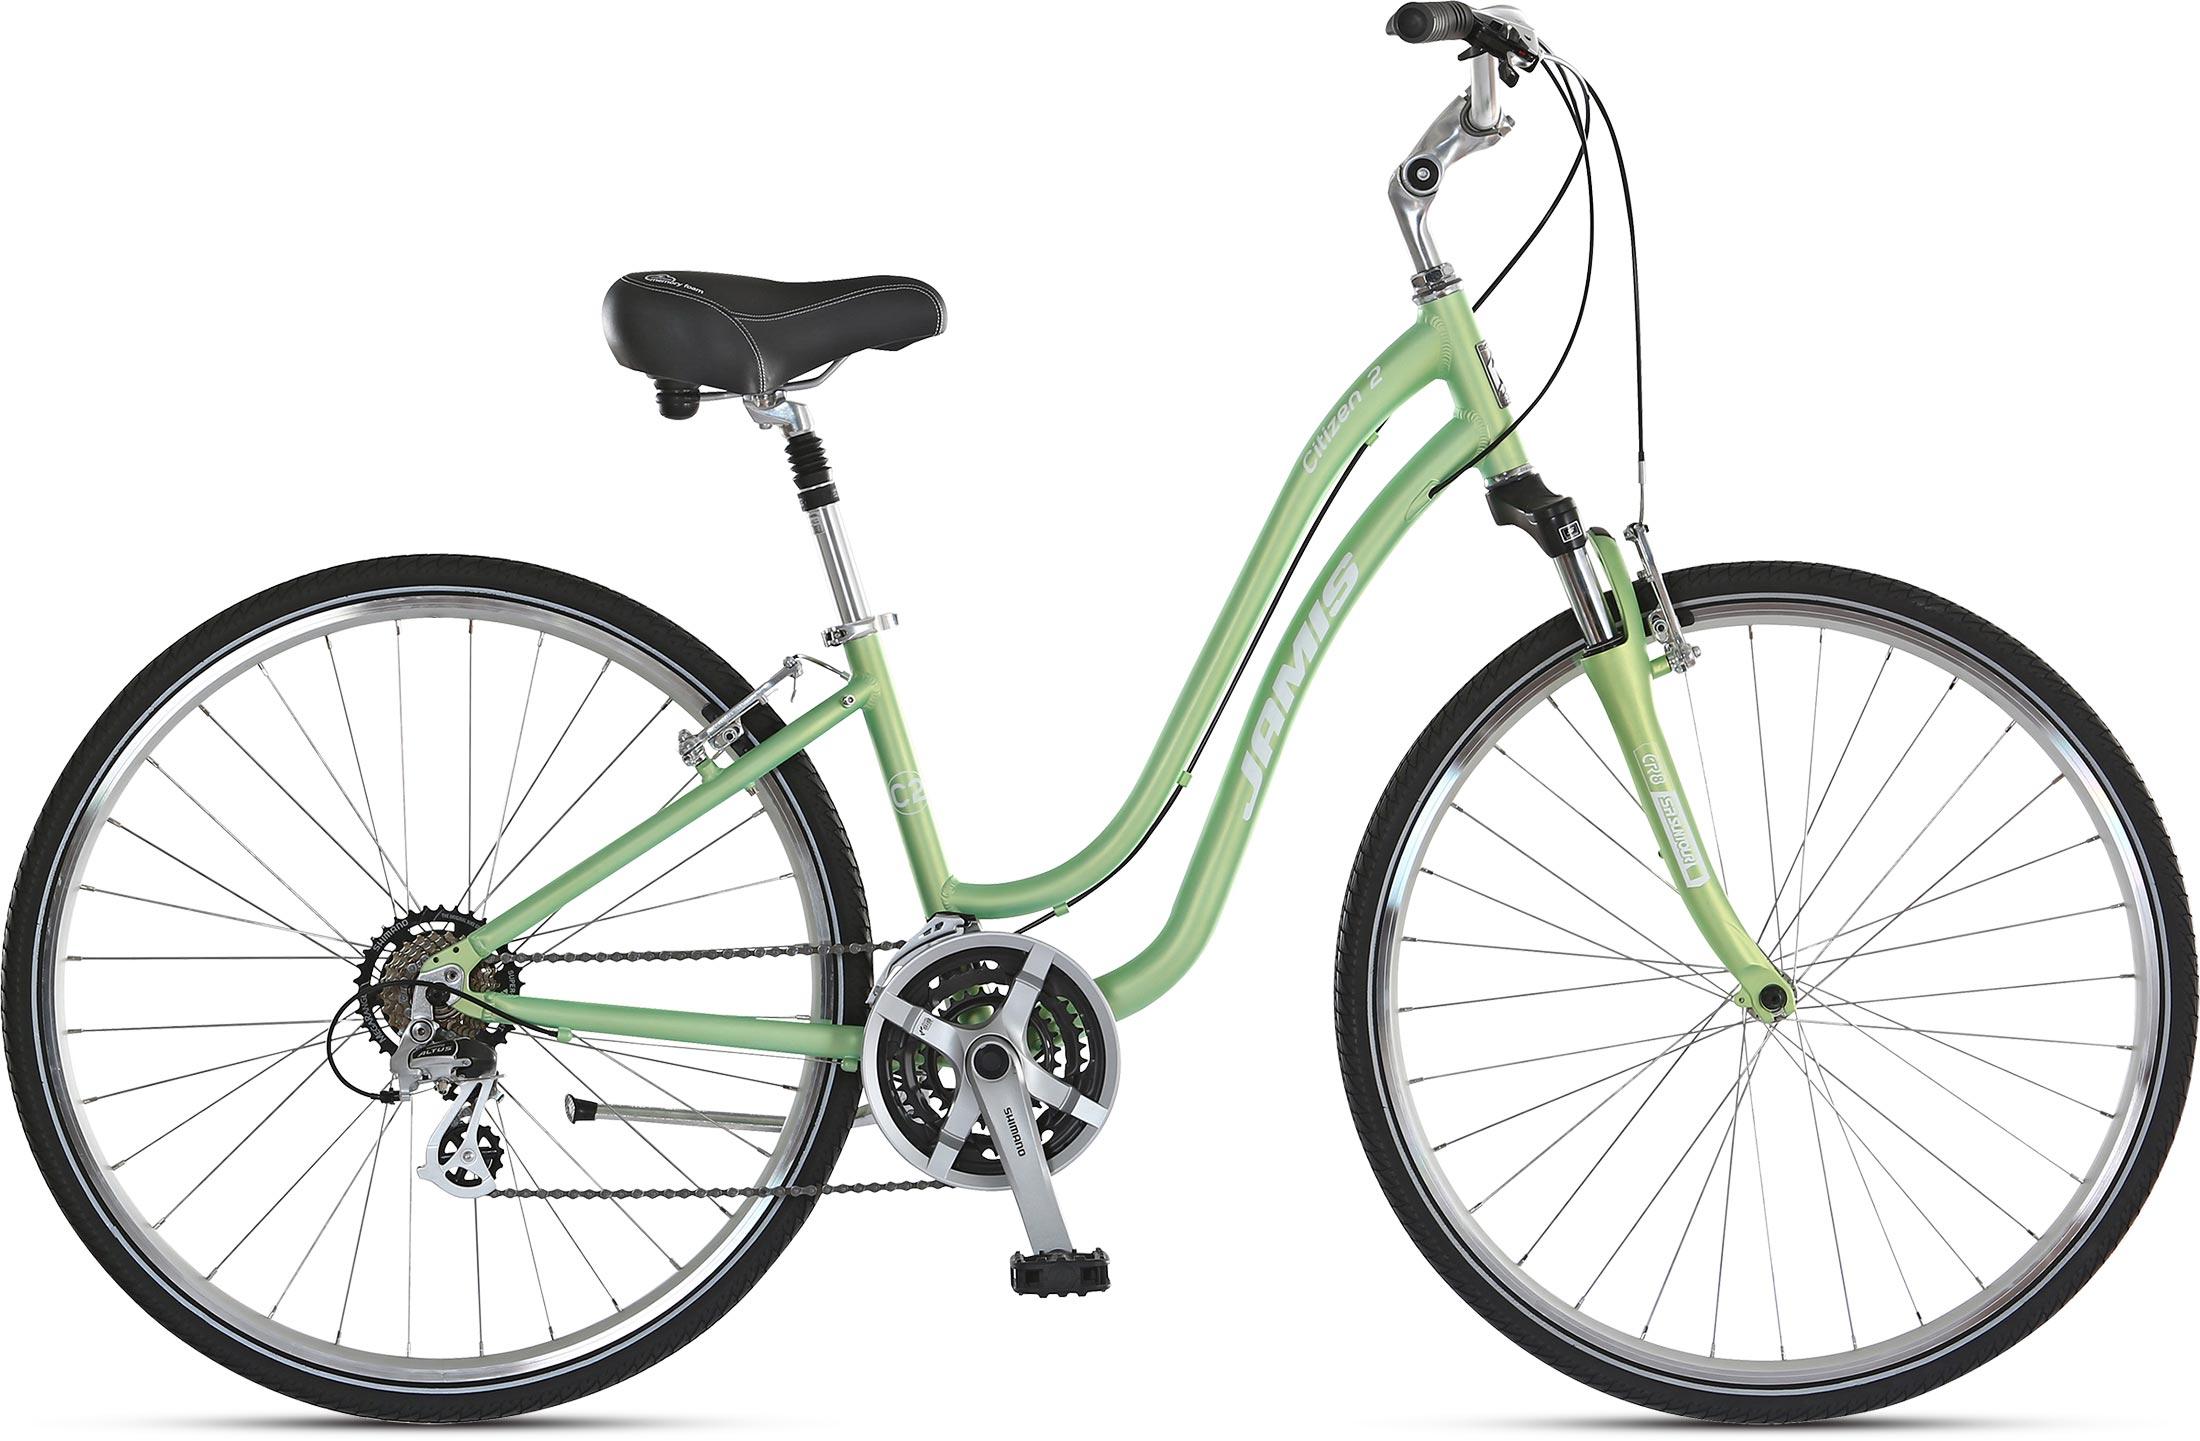 the expert suburban bike bicycles mens s ultimate biking comfort guide reviews schwinn buyer comforter